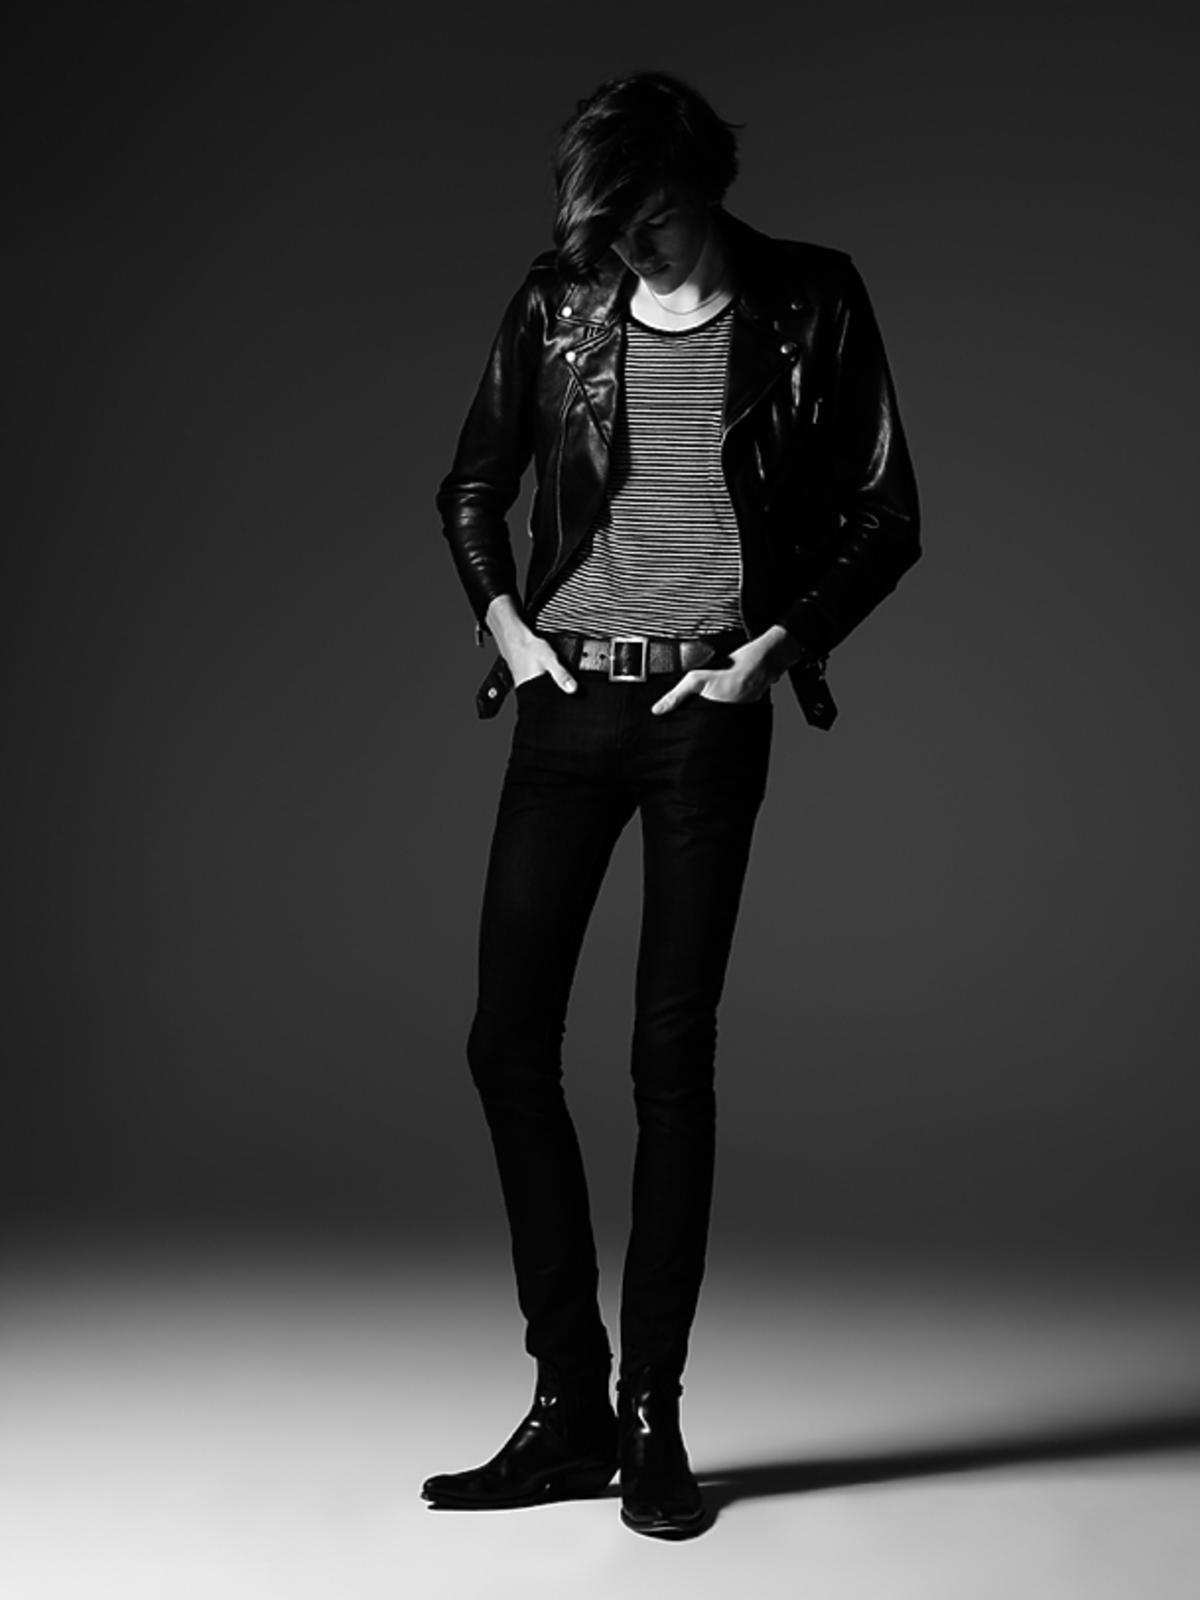 Dylan Brosnan Saint Laurent wiosna lato 2015. Syn Pierce'a Brosnana